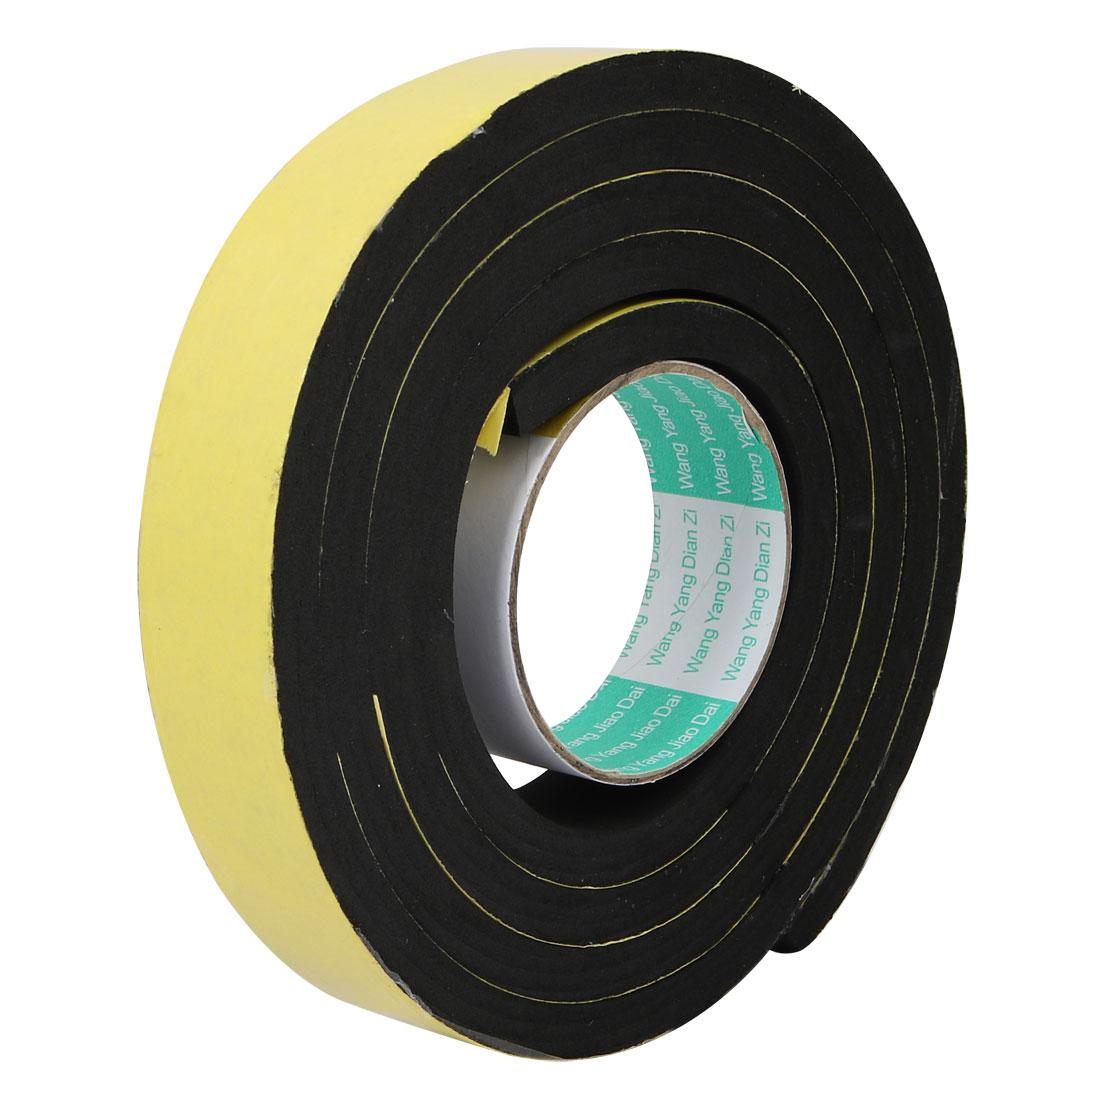 35mm Wide 10mm Thick Single Sided Shockproof EVA Sponge Tape Black 2 Meters Long